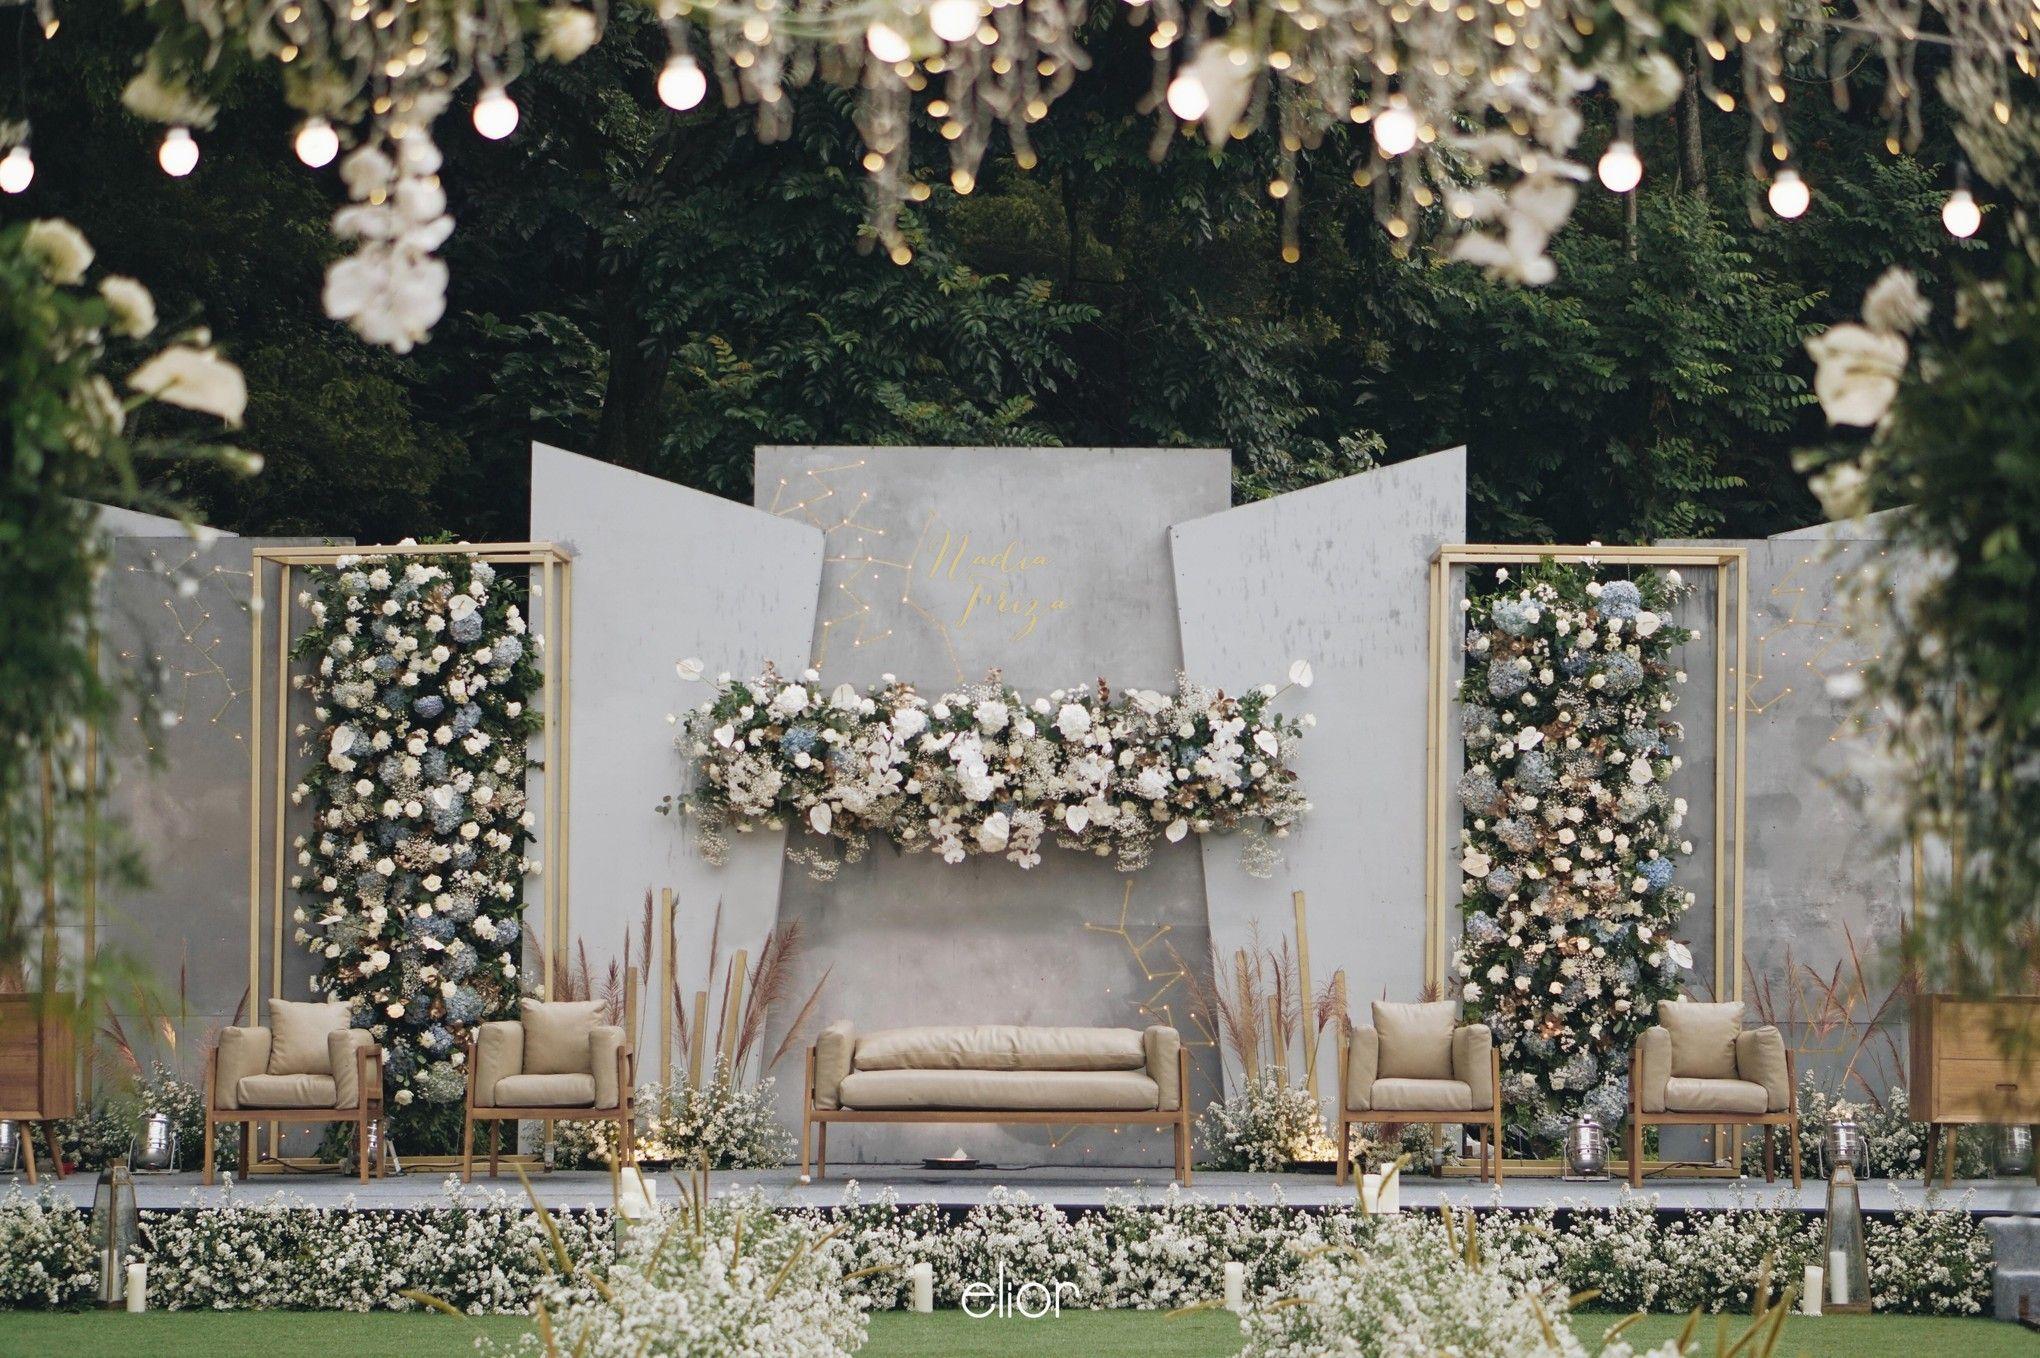 Pin By My Romantic Wedding On Wedding Ideas In 2020 Wedding Backdrop Decorations Wedding Background Decoration Wedding Stage Design